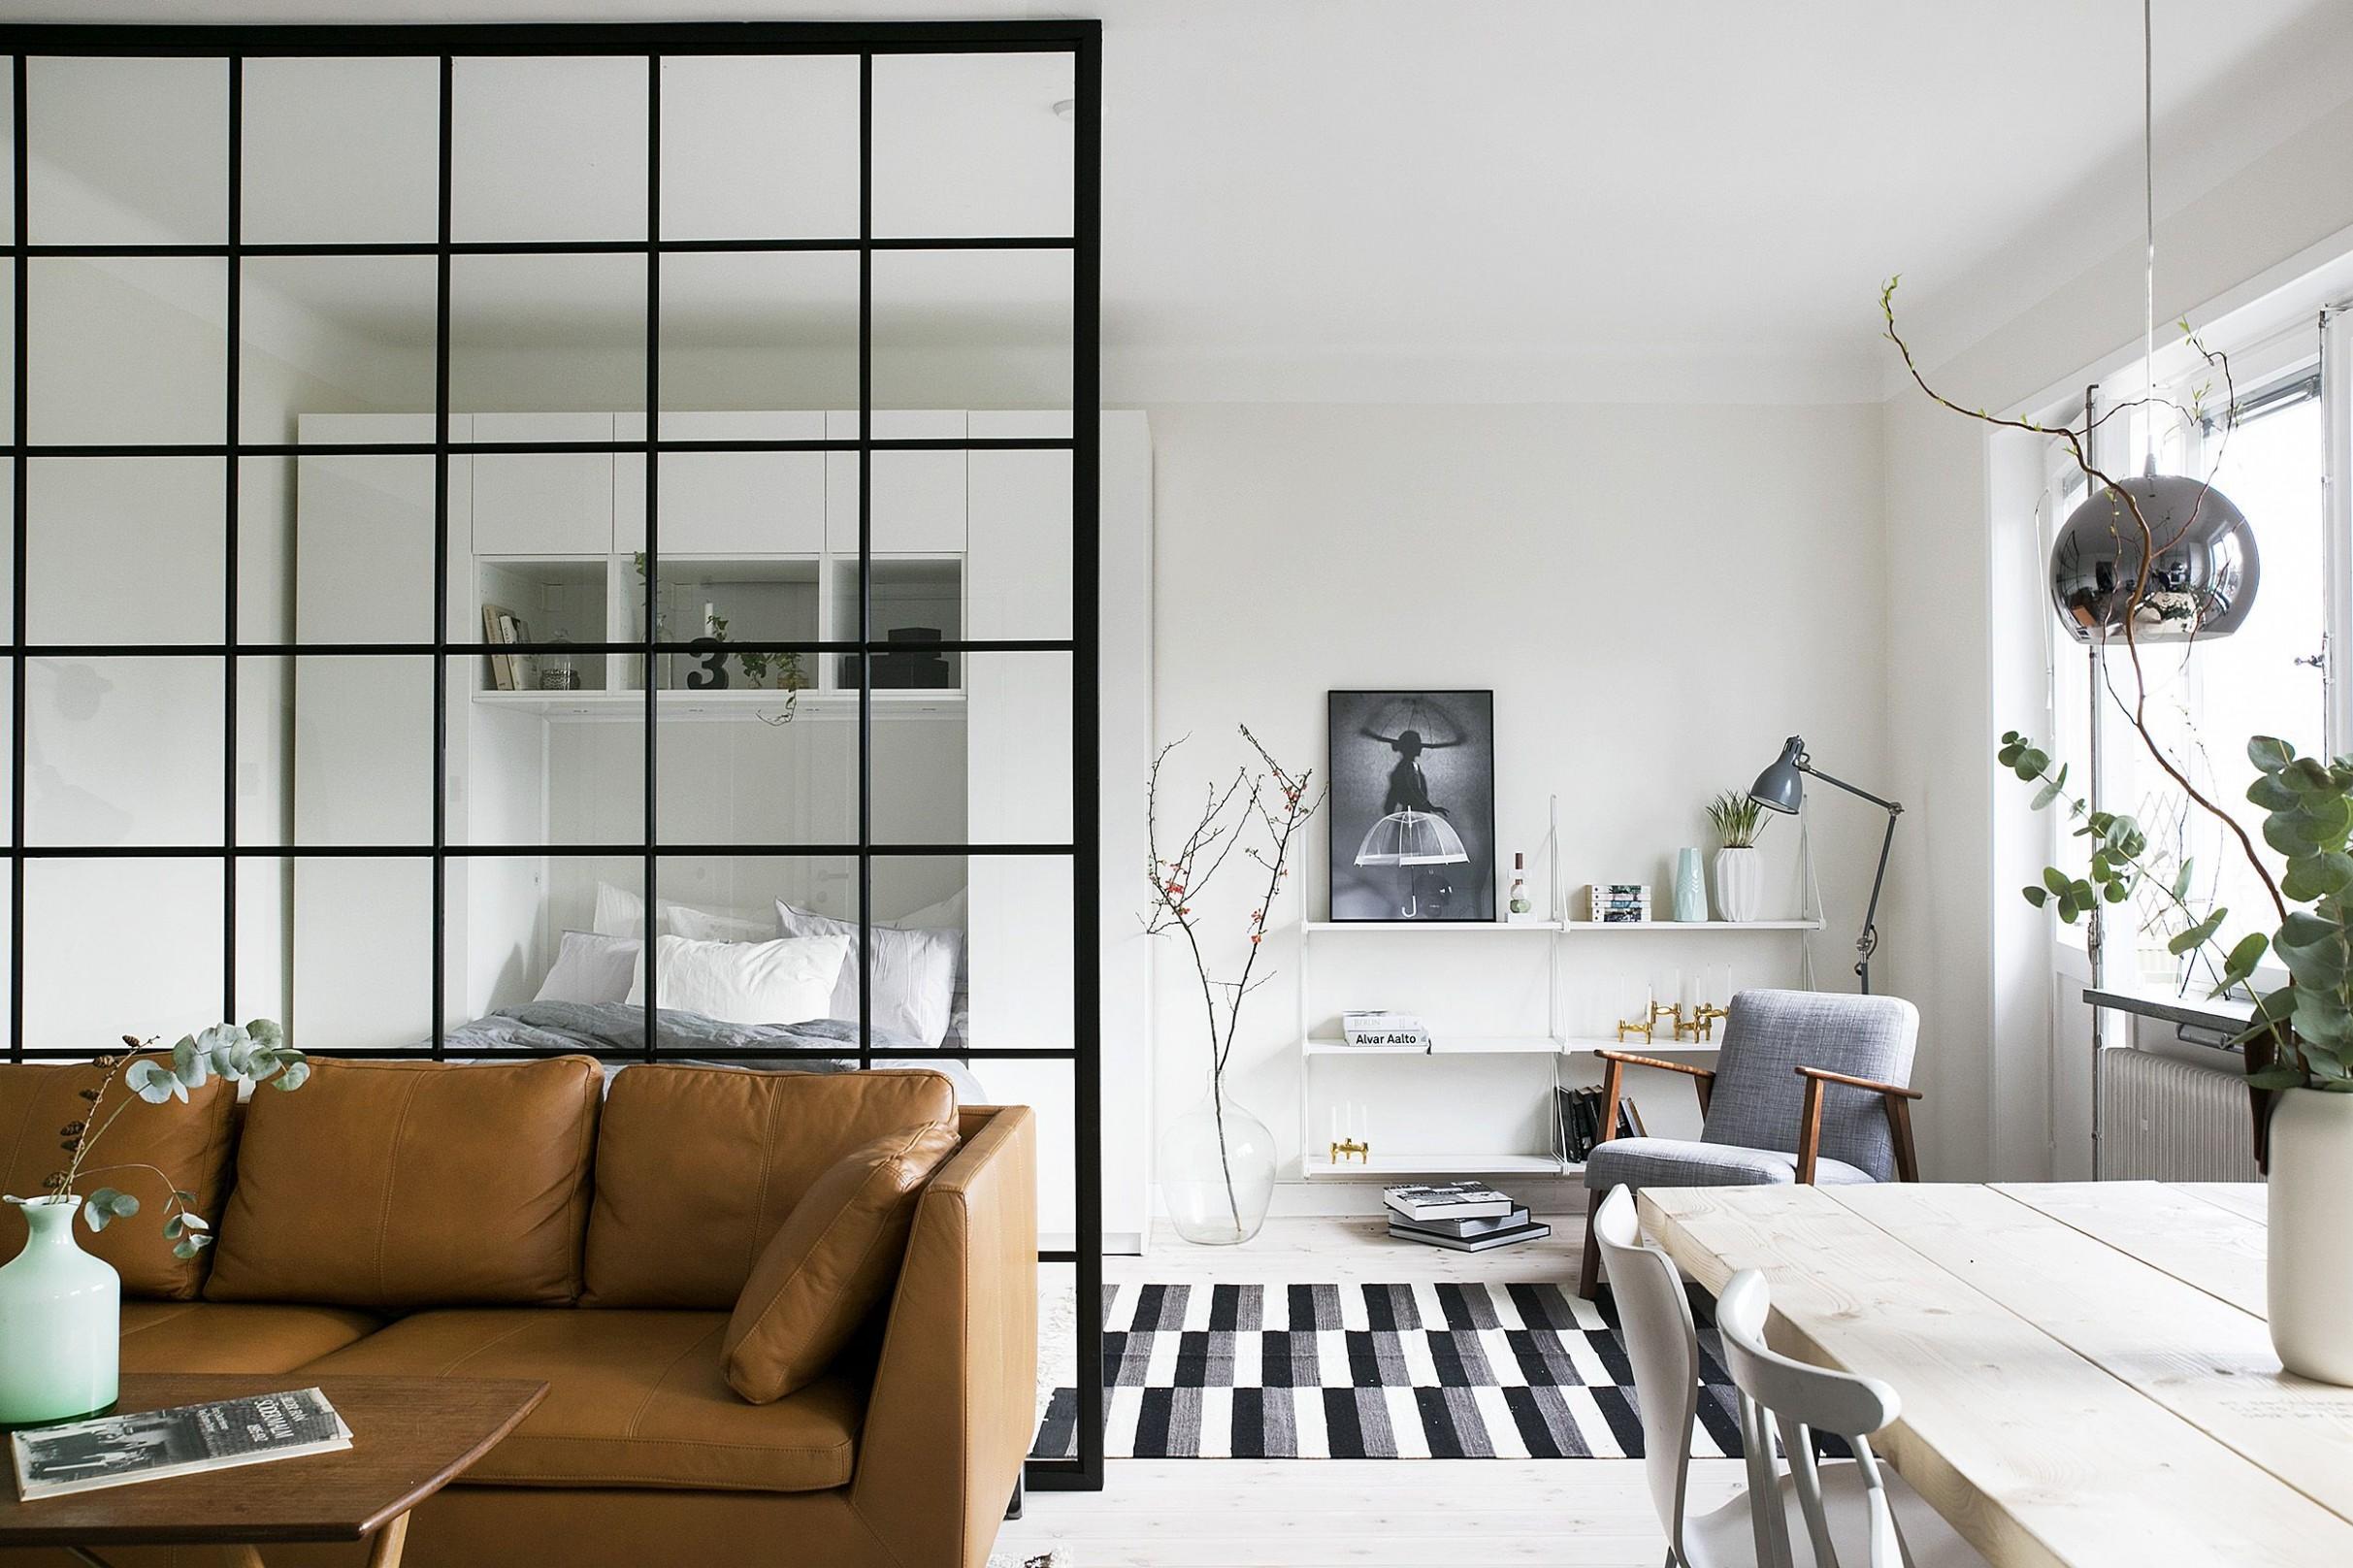 How to Decorate a Studio Apartment - 8 Studio Apartment Ideas - One Room Apartment Decor Ideas